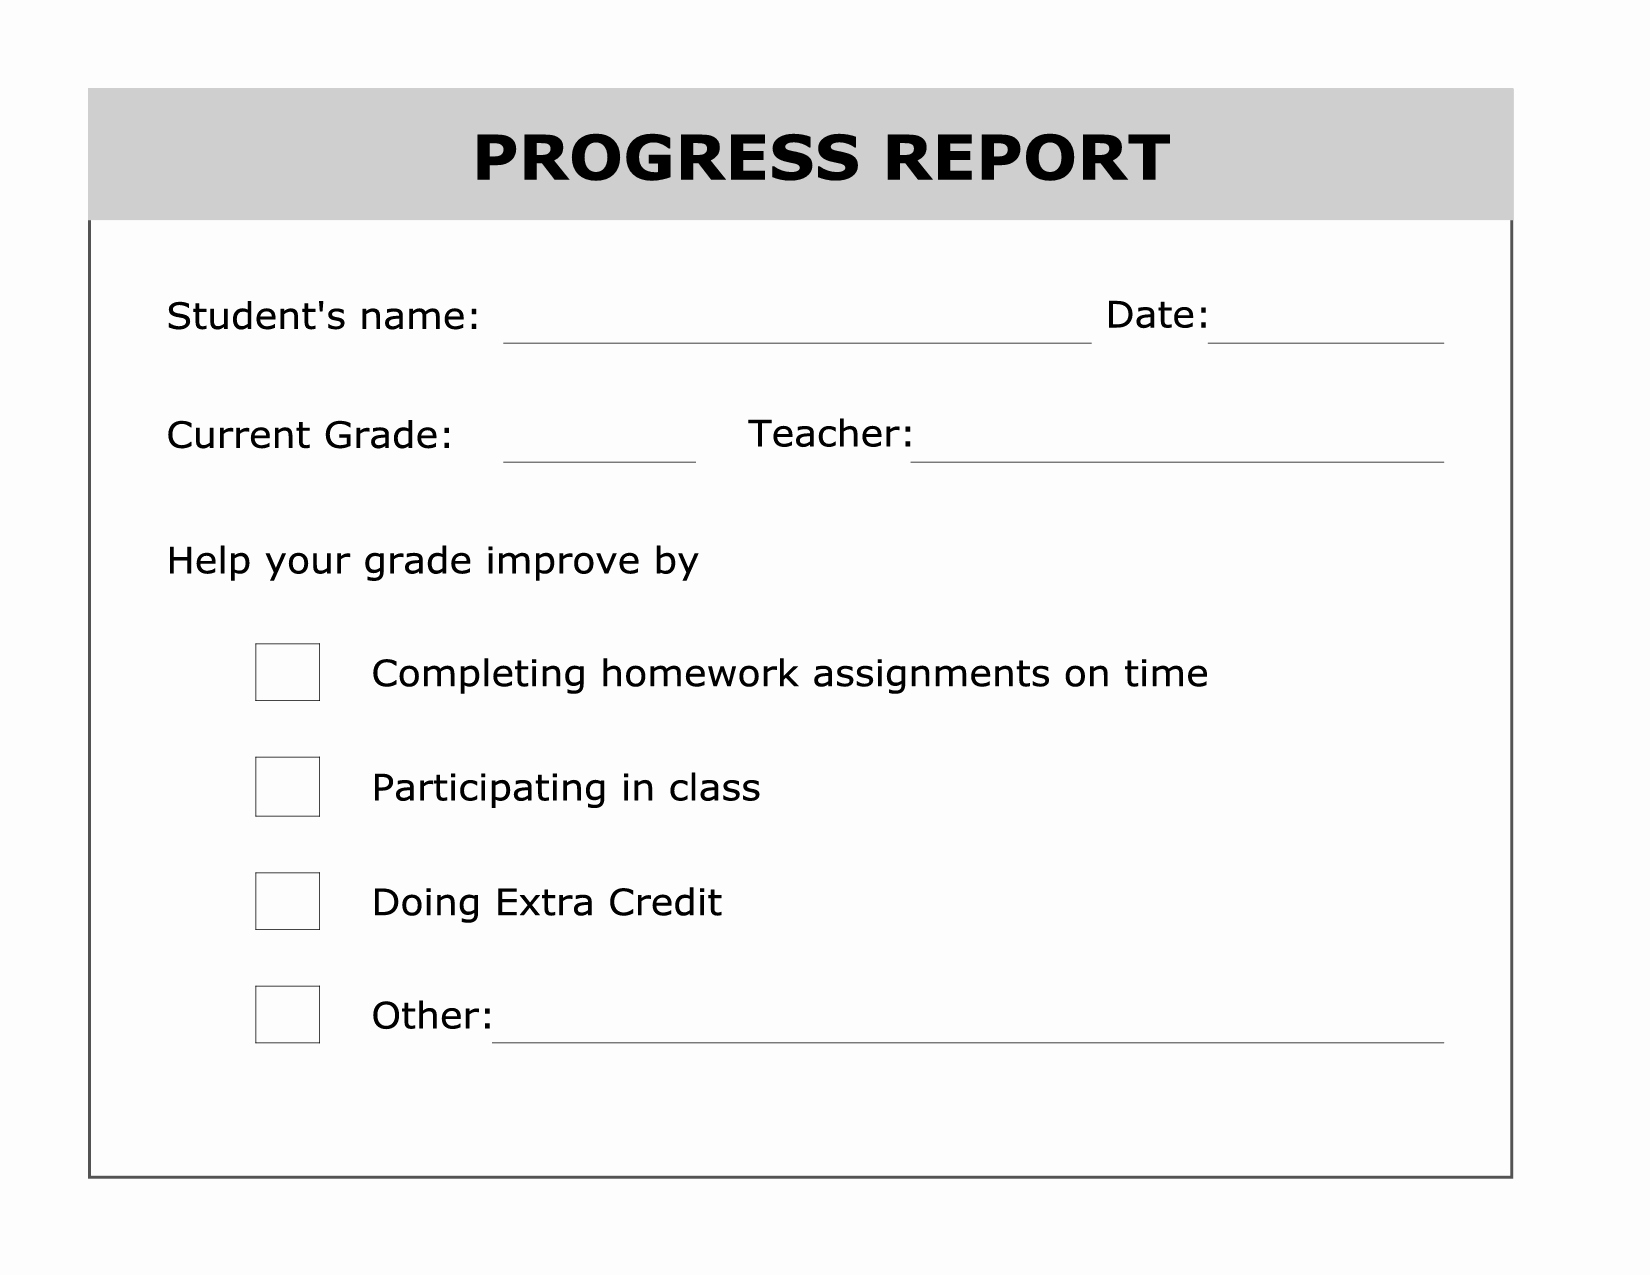 School Progress Report Template Inspirational Printable Progress Report Template Good Ideas